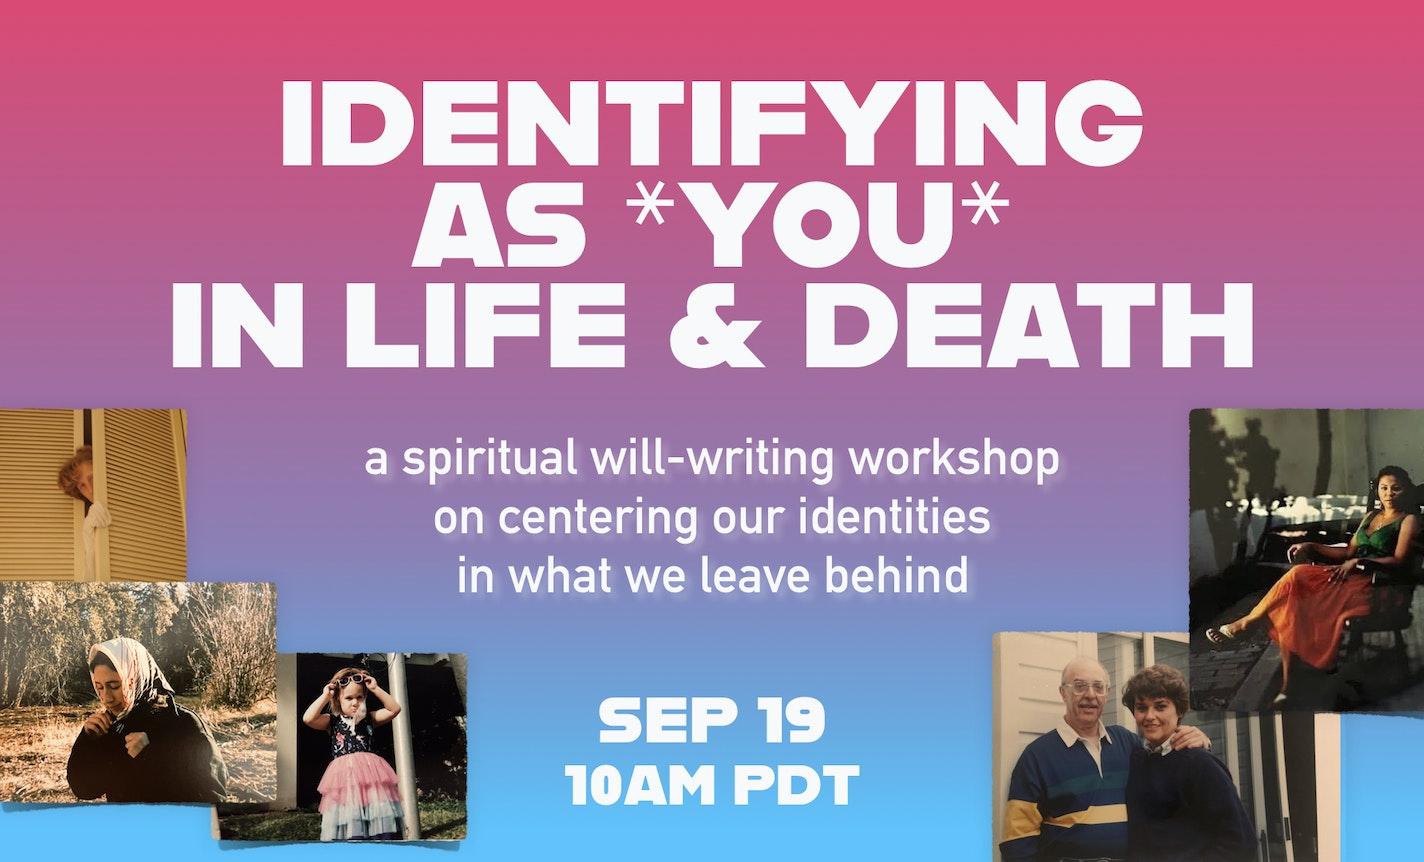 Spiritual Will-Writing: Identifying as You in Life & Death